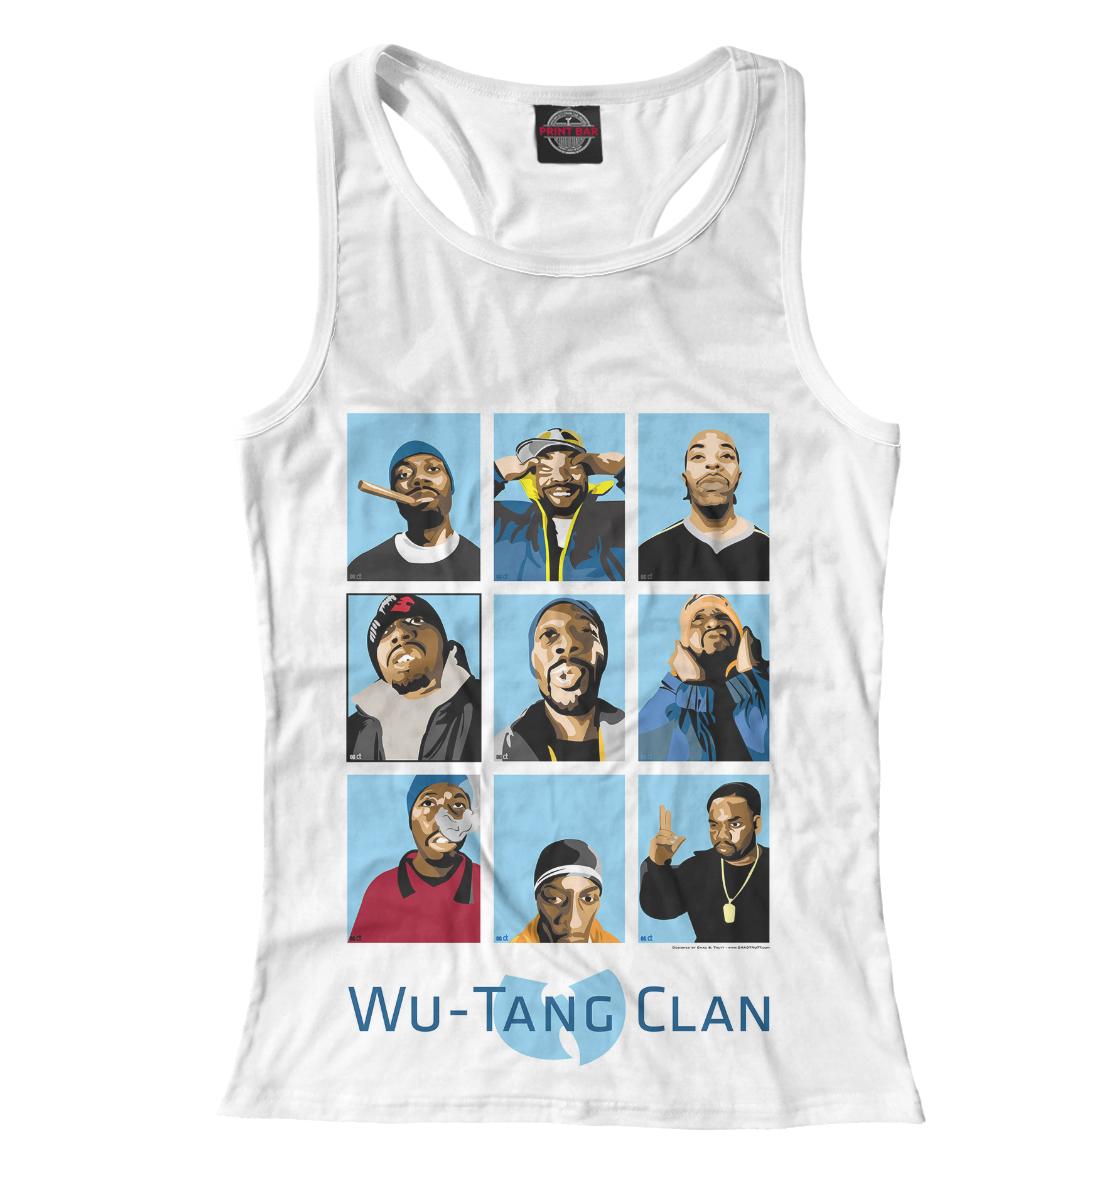 Купить Wu-Tang Clan, Printbar, Майки борцовки, WTK-204372-mayb-1